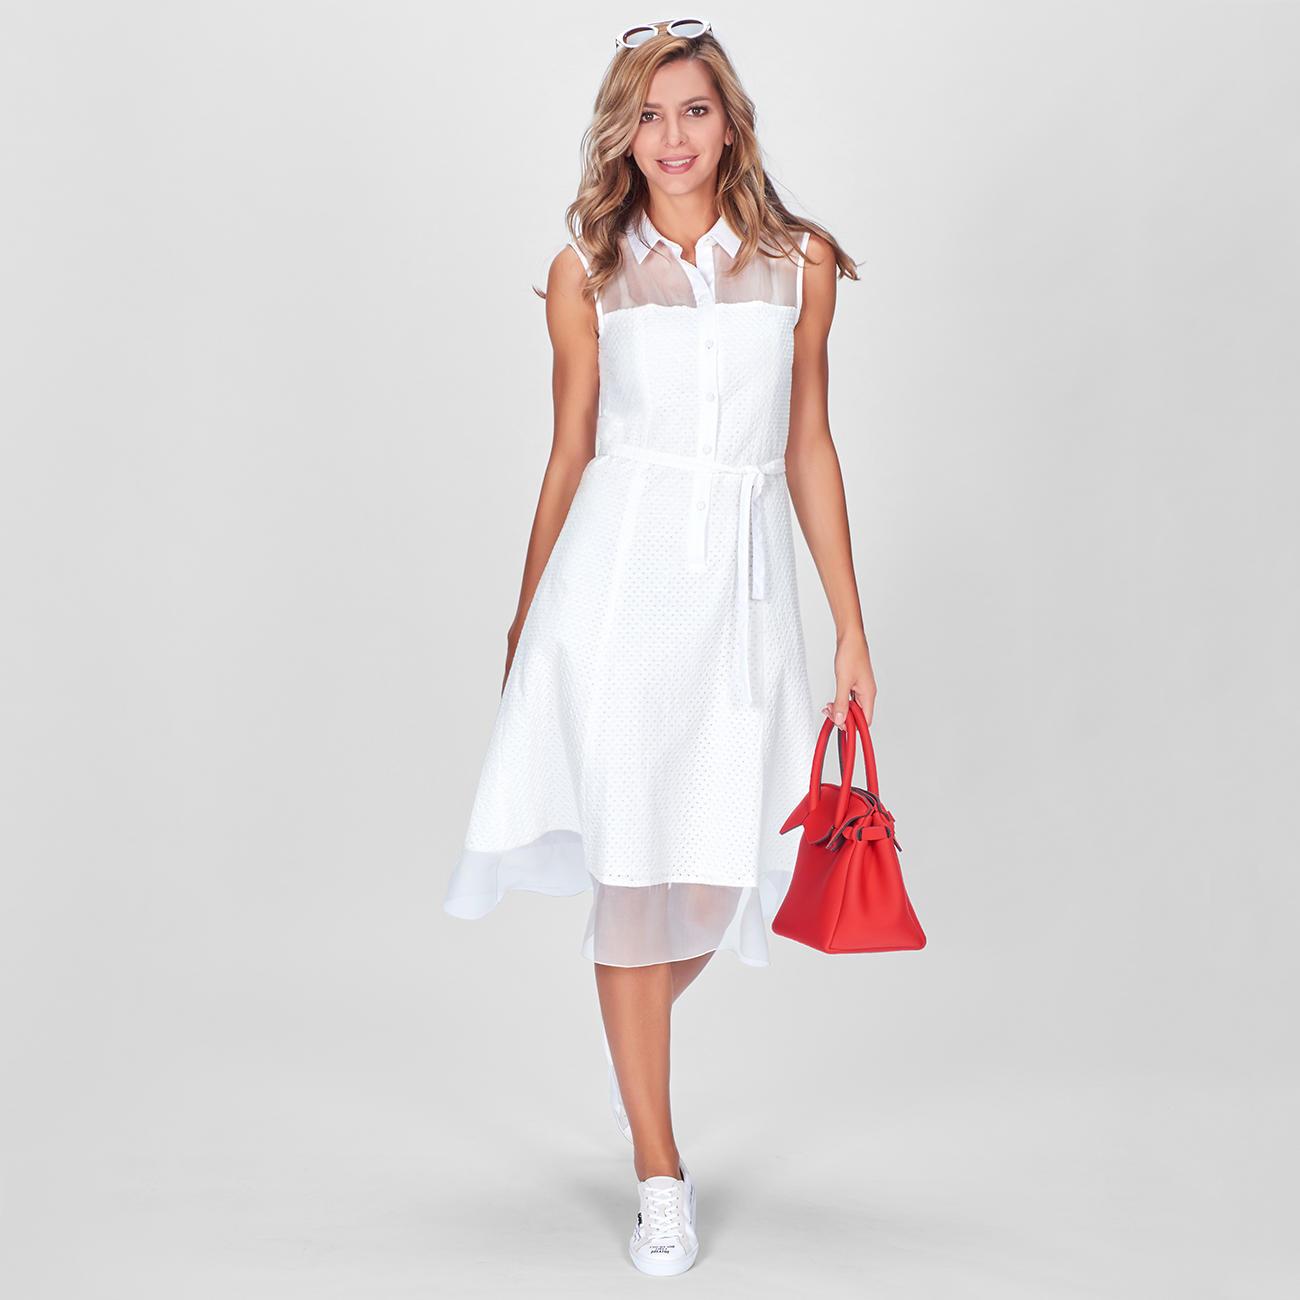 1c5ca4fec1f335 Paule Ka Couture-Kleid   Designer-Highlights